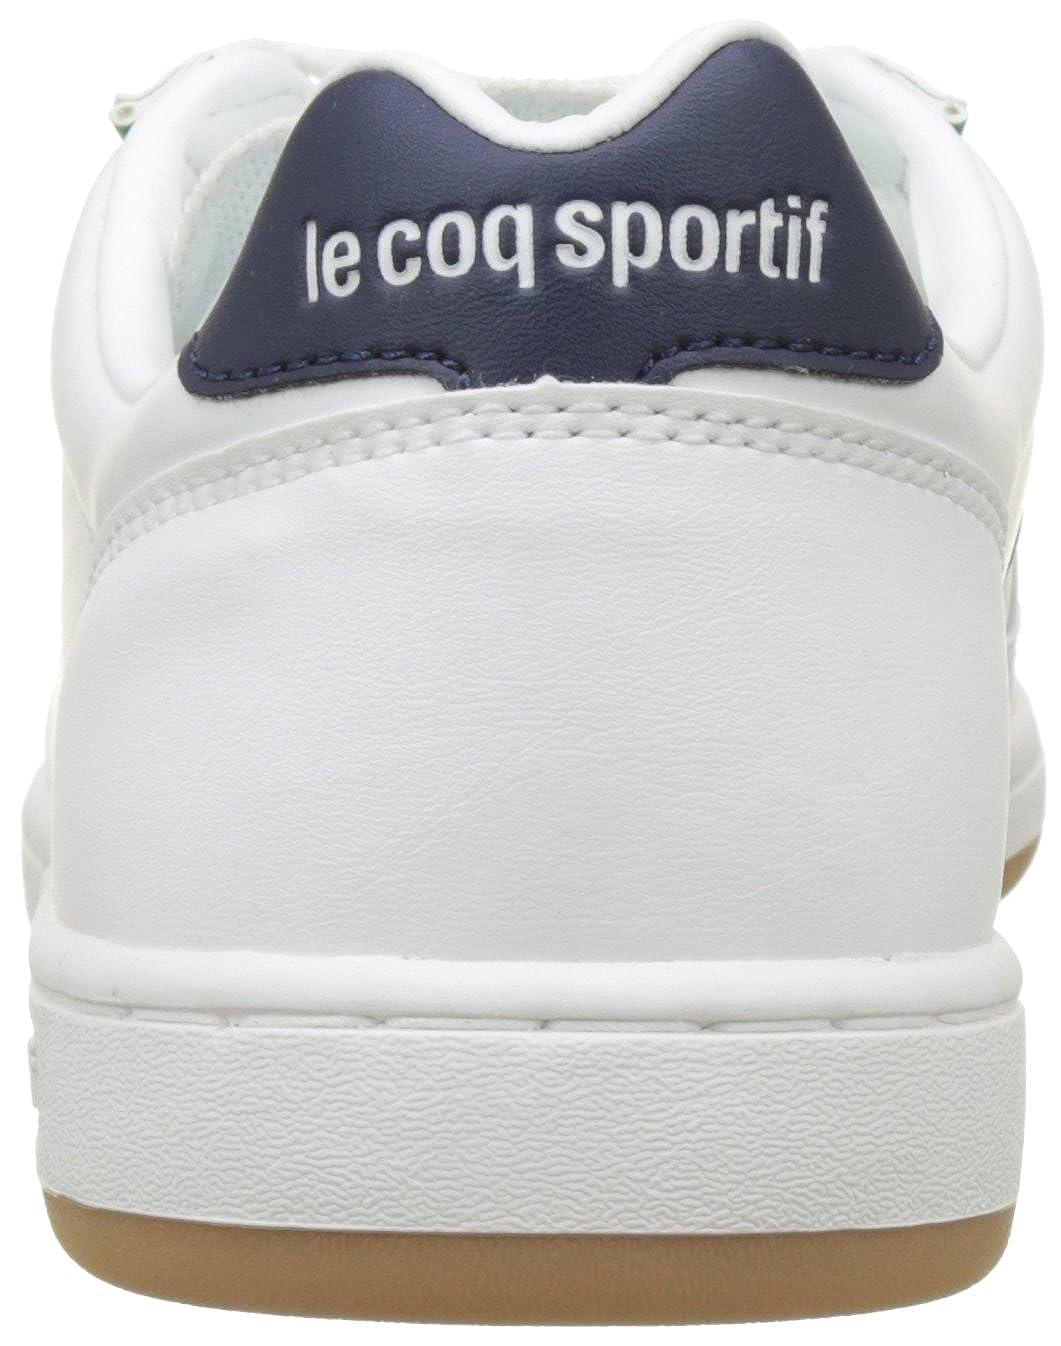 72b7a379b931 Amazon.com  Le Coq Sportif Unisex Adults  Icons Lea Sport Gum Bass  Trainers